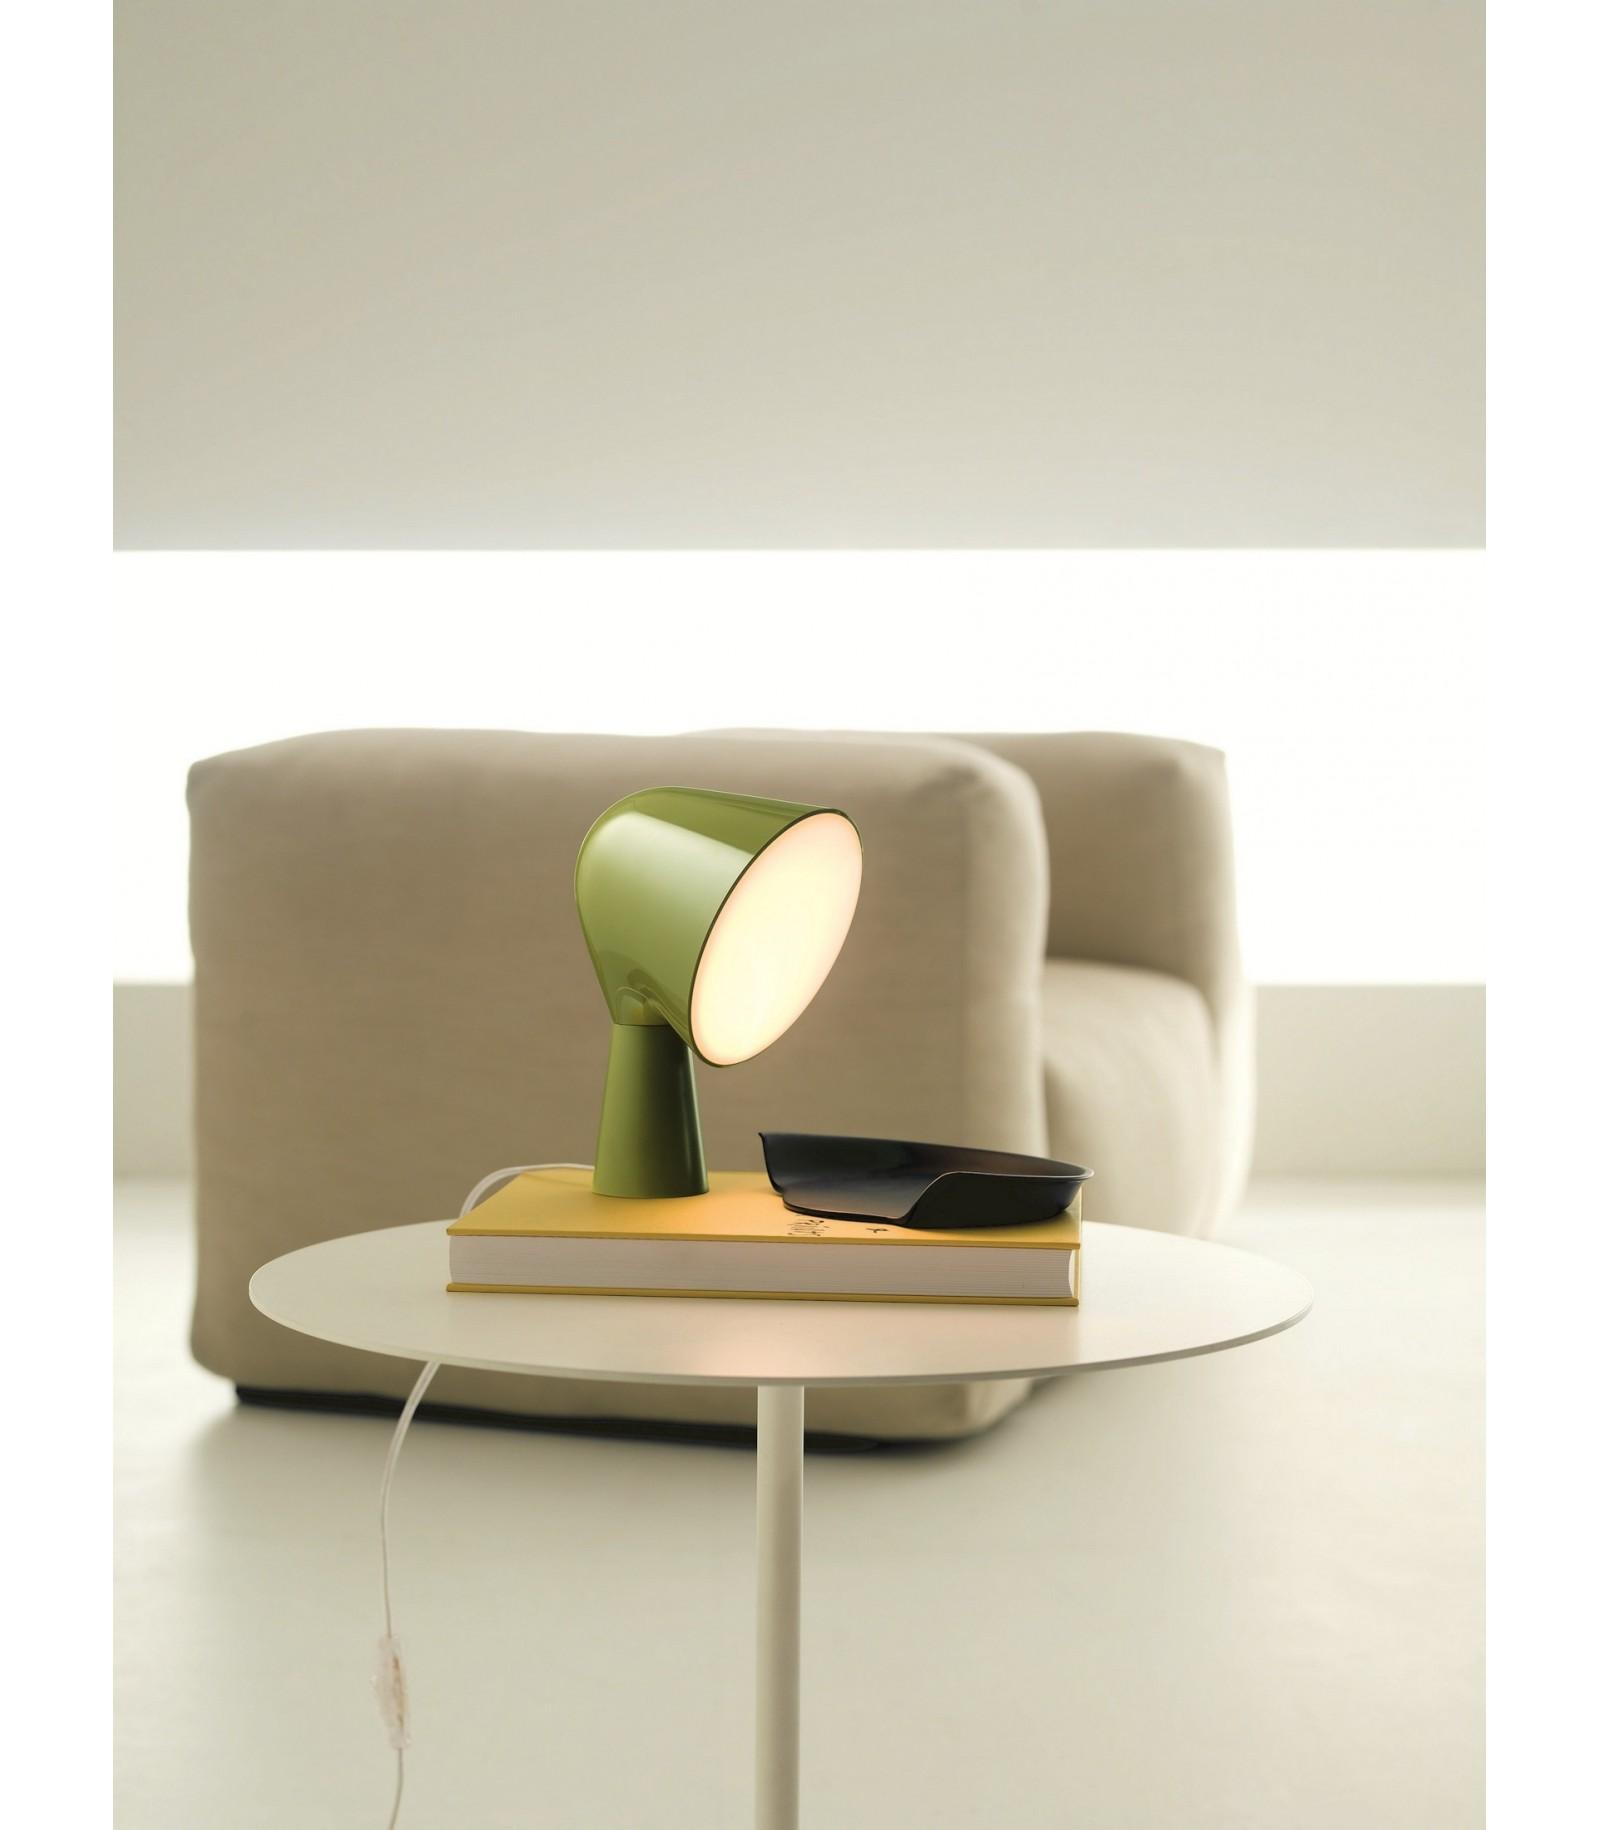 Foscarini binic table lamp rosa 200001 61 - Lamp binic ...